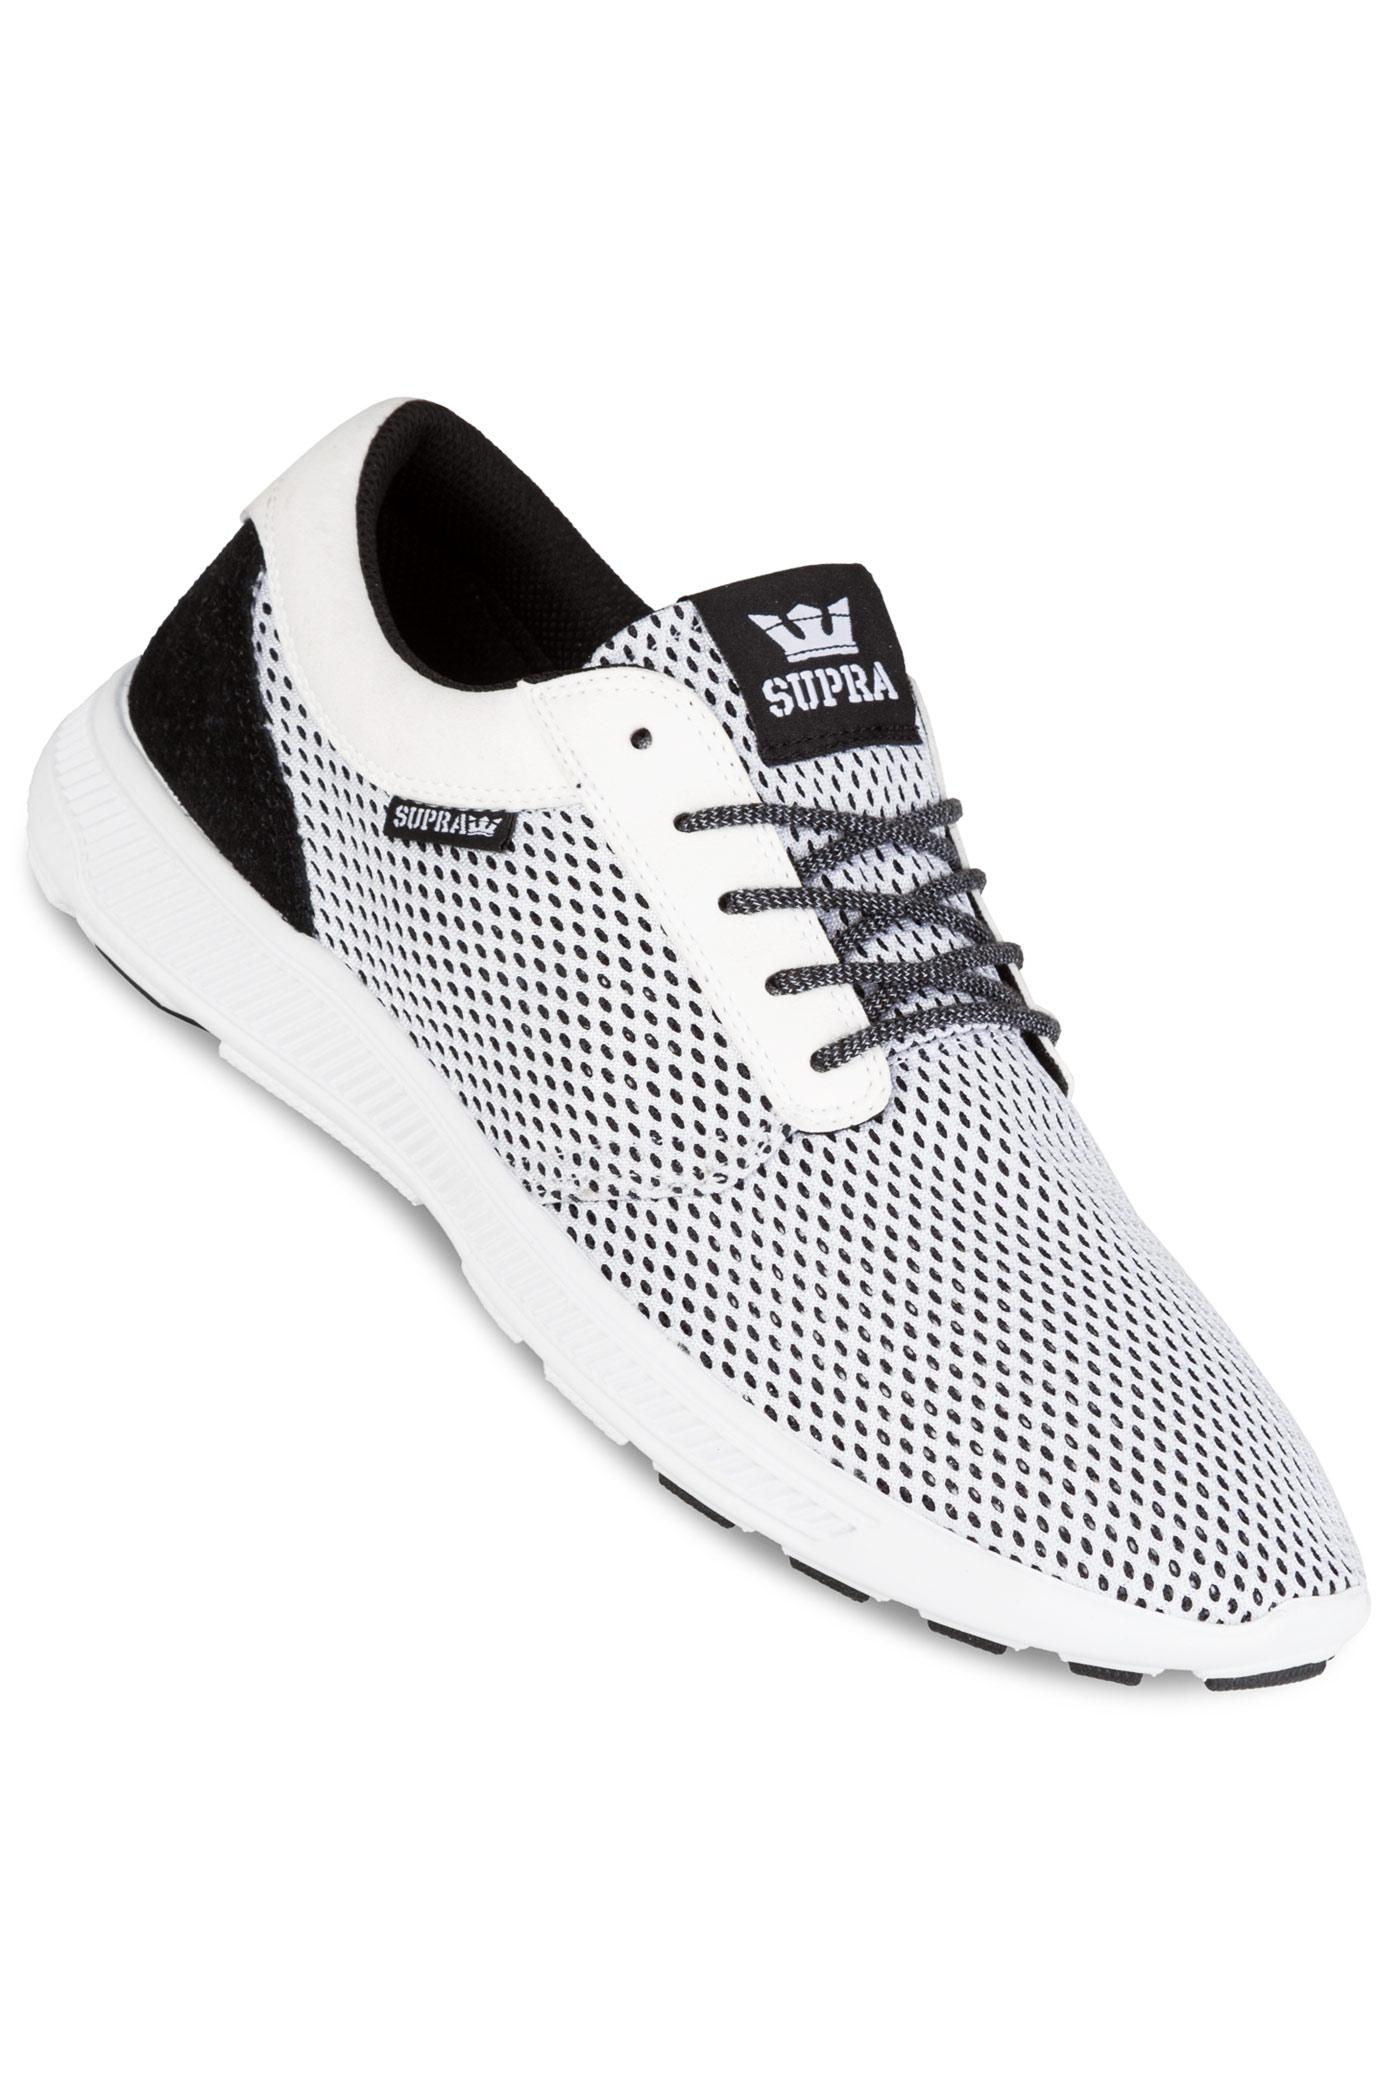 supra hammer run shoes white black buy at skatedeluxe. Black Bedroom Furniture Sets. Home Design Ideas